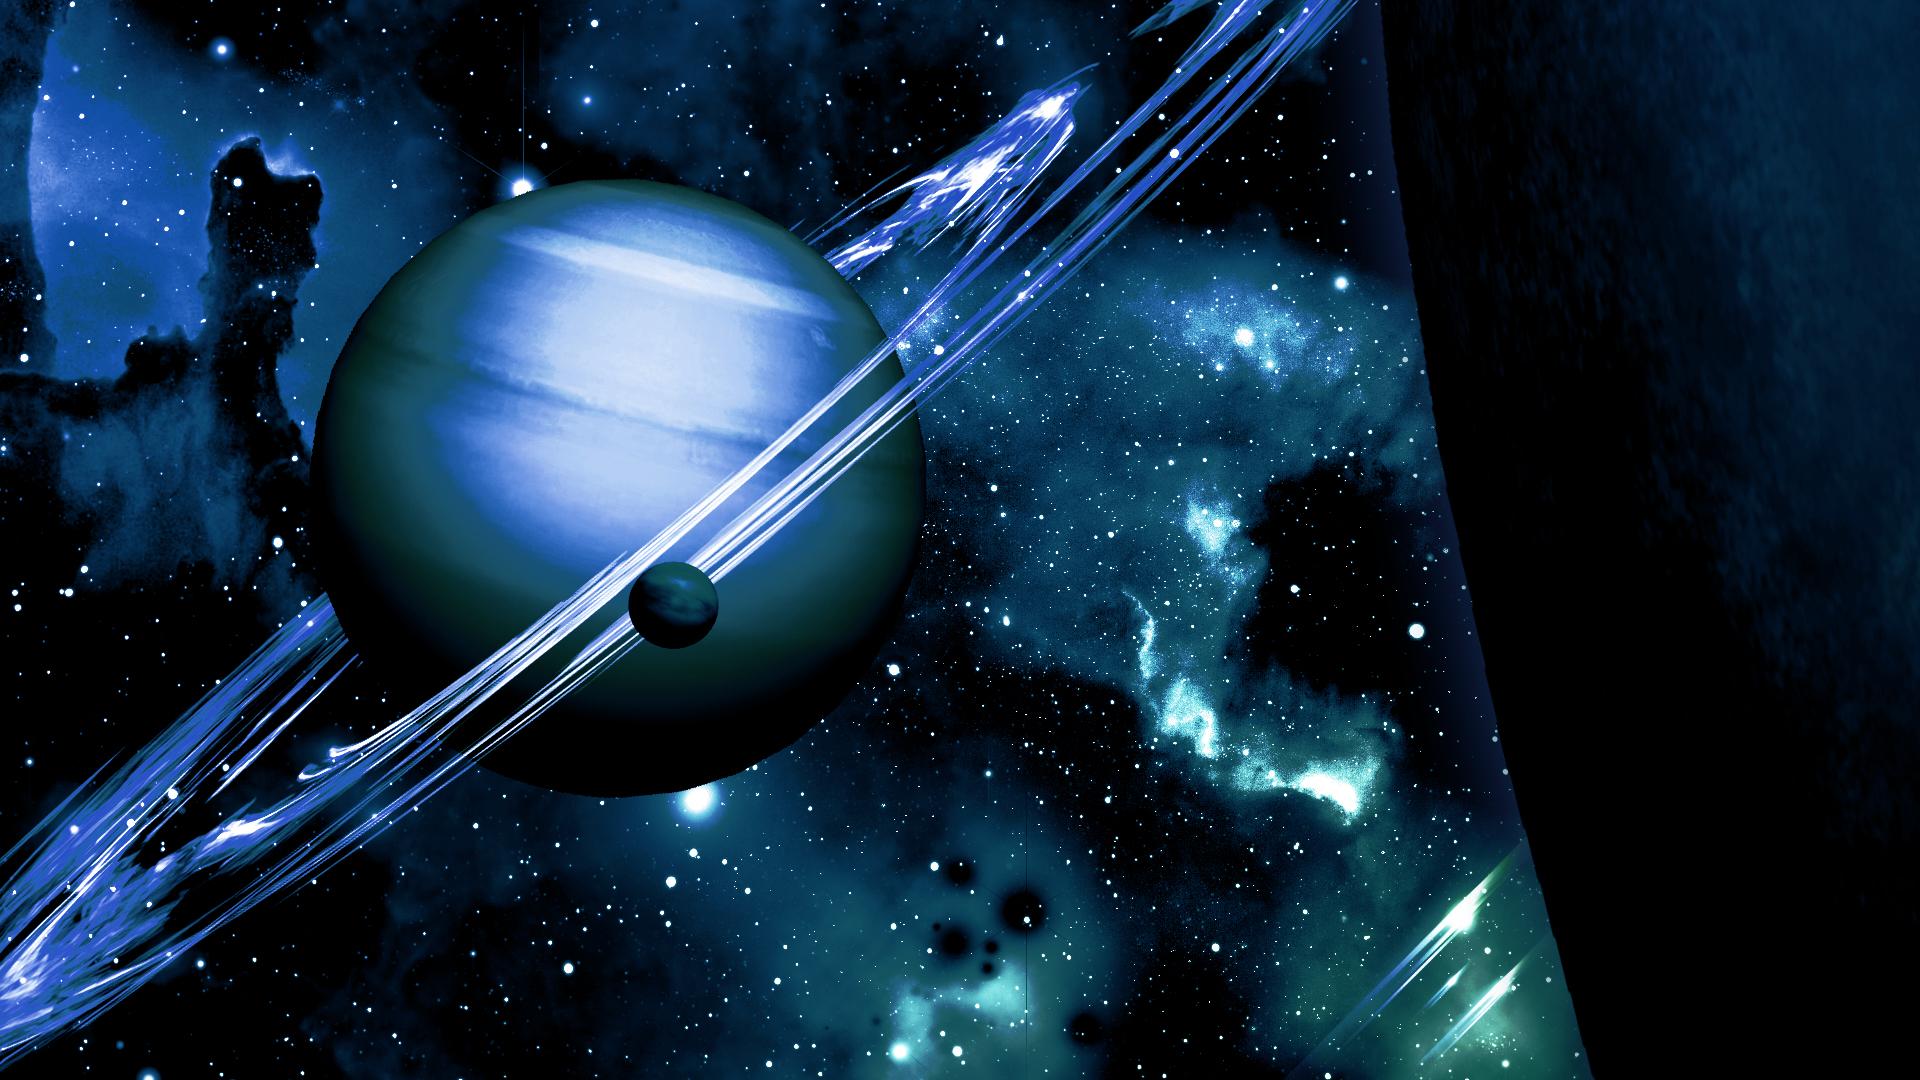 Planets 5 wallpaper by hardii on deviantart - Nasa screensaver ...